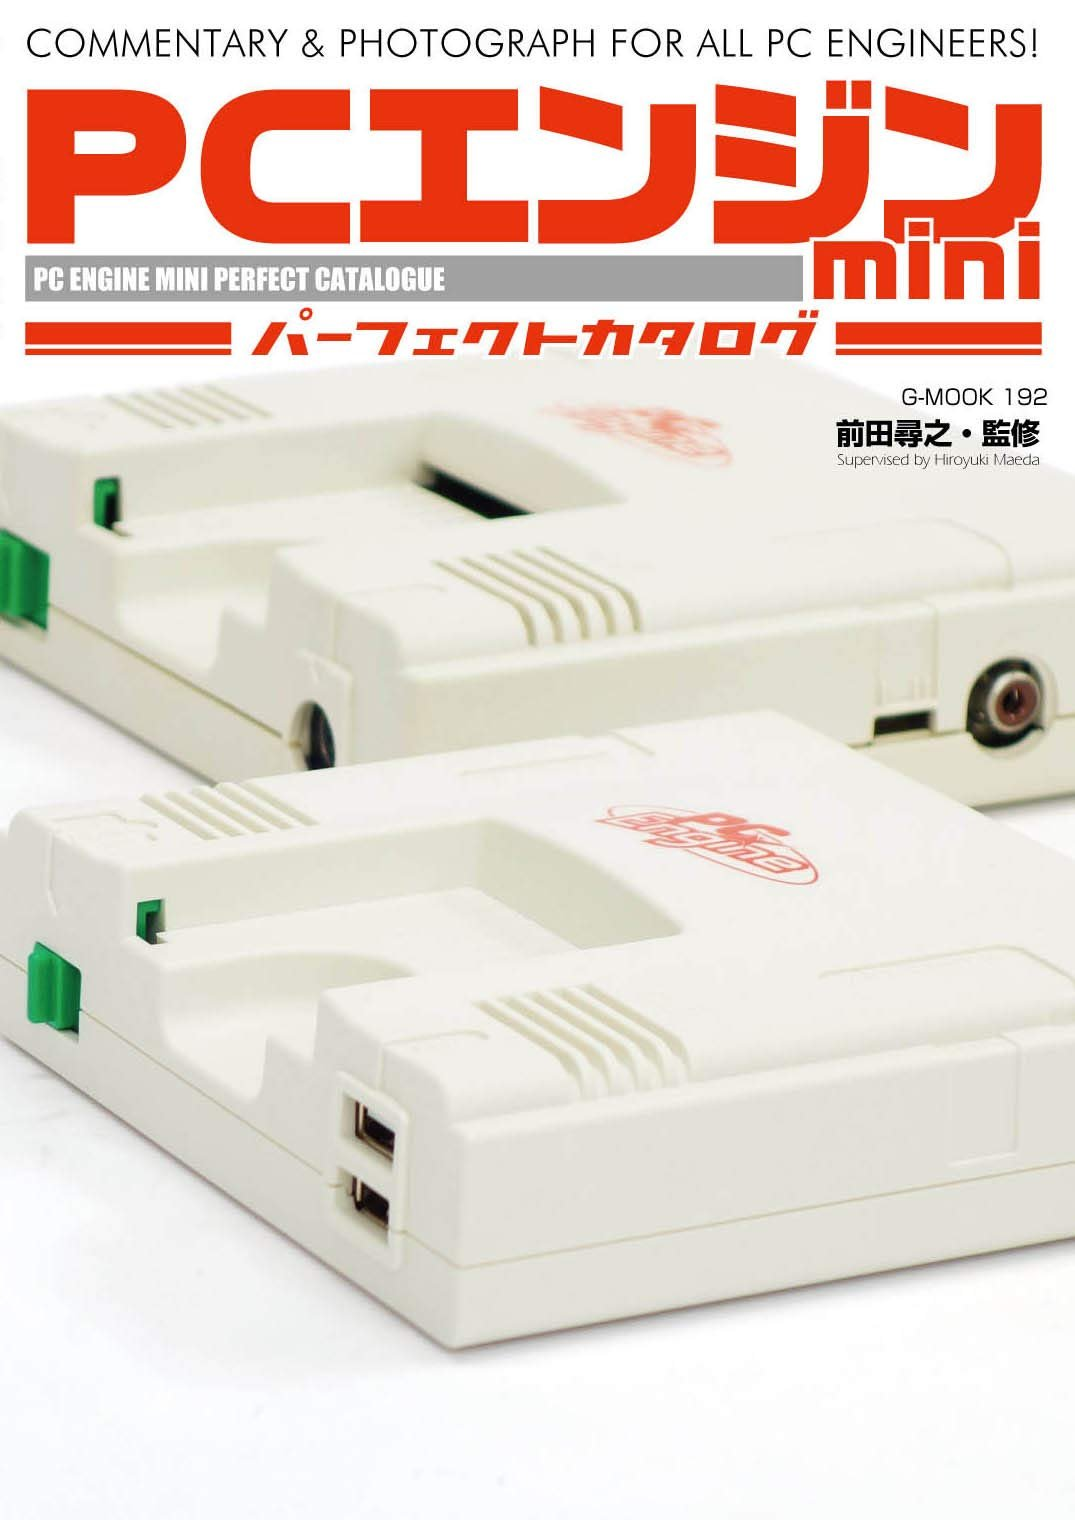 PC Engine Mini Perfect Catalogue